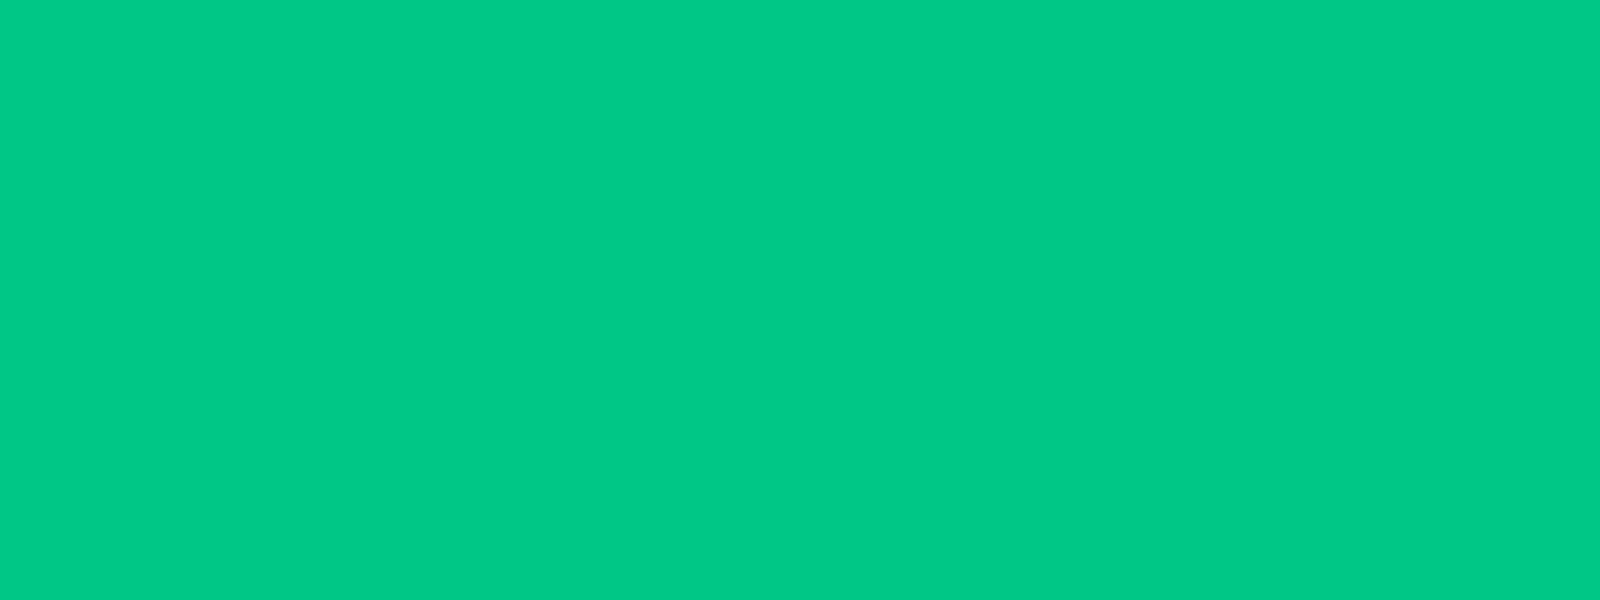 Photography image - Loading green.jpg